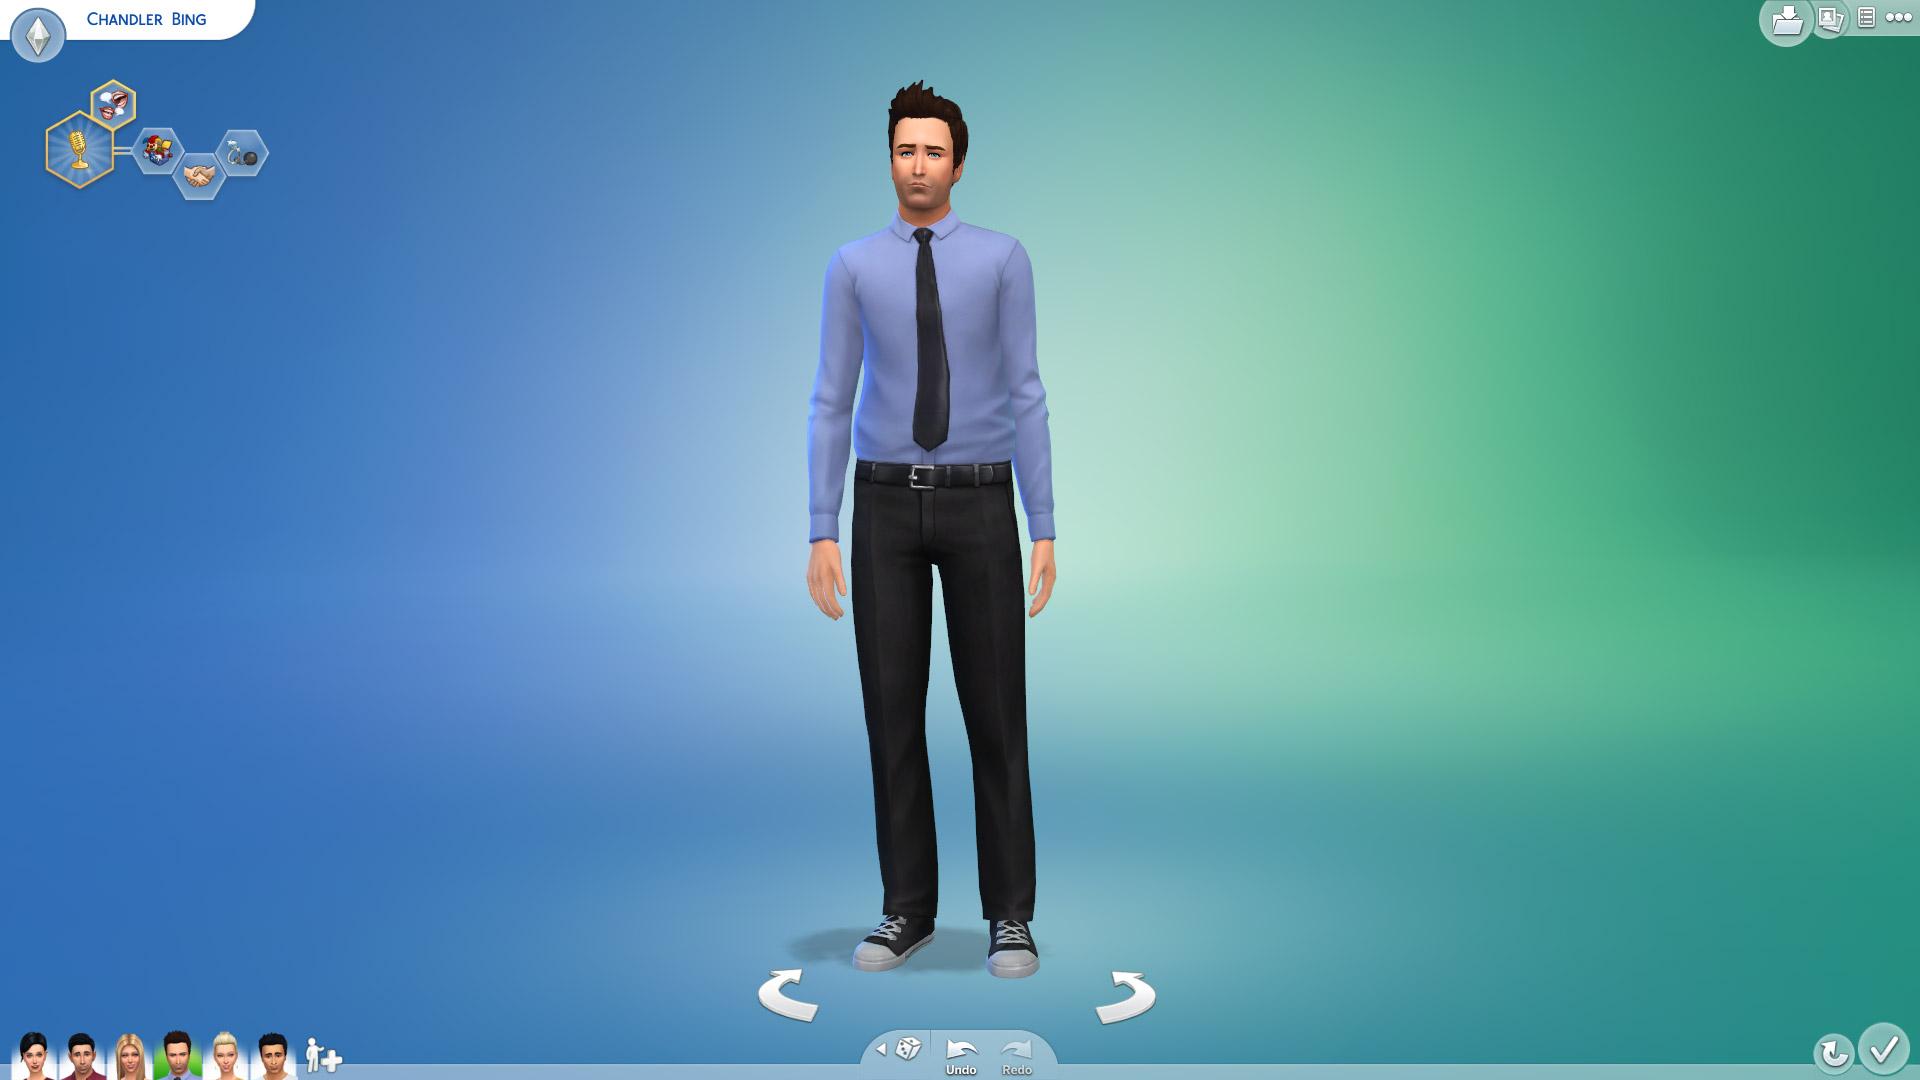 Chandler Bing In Sims